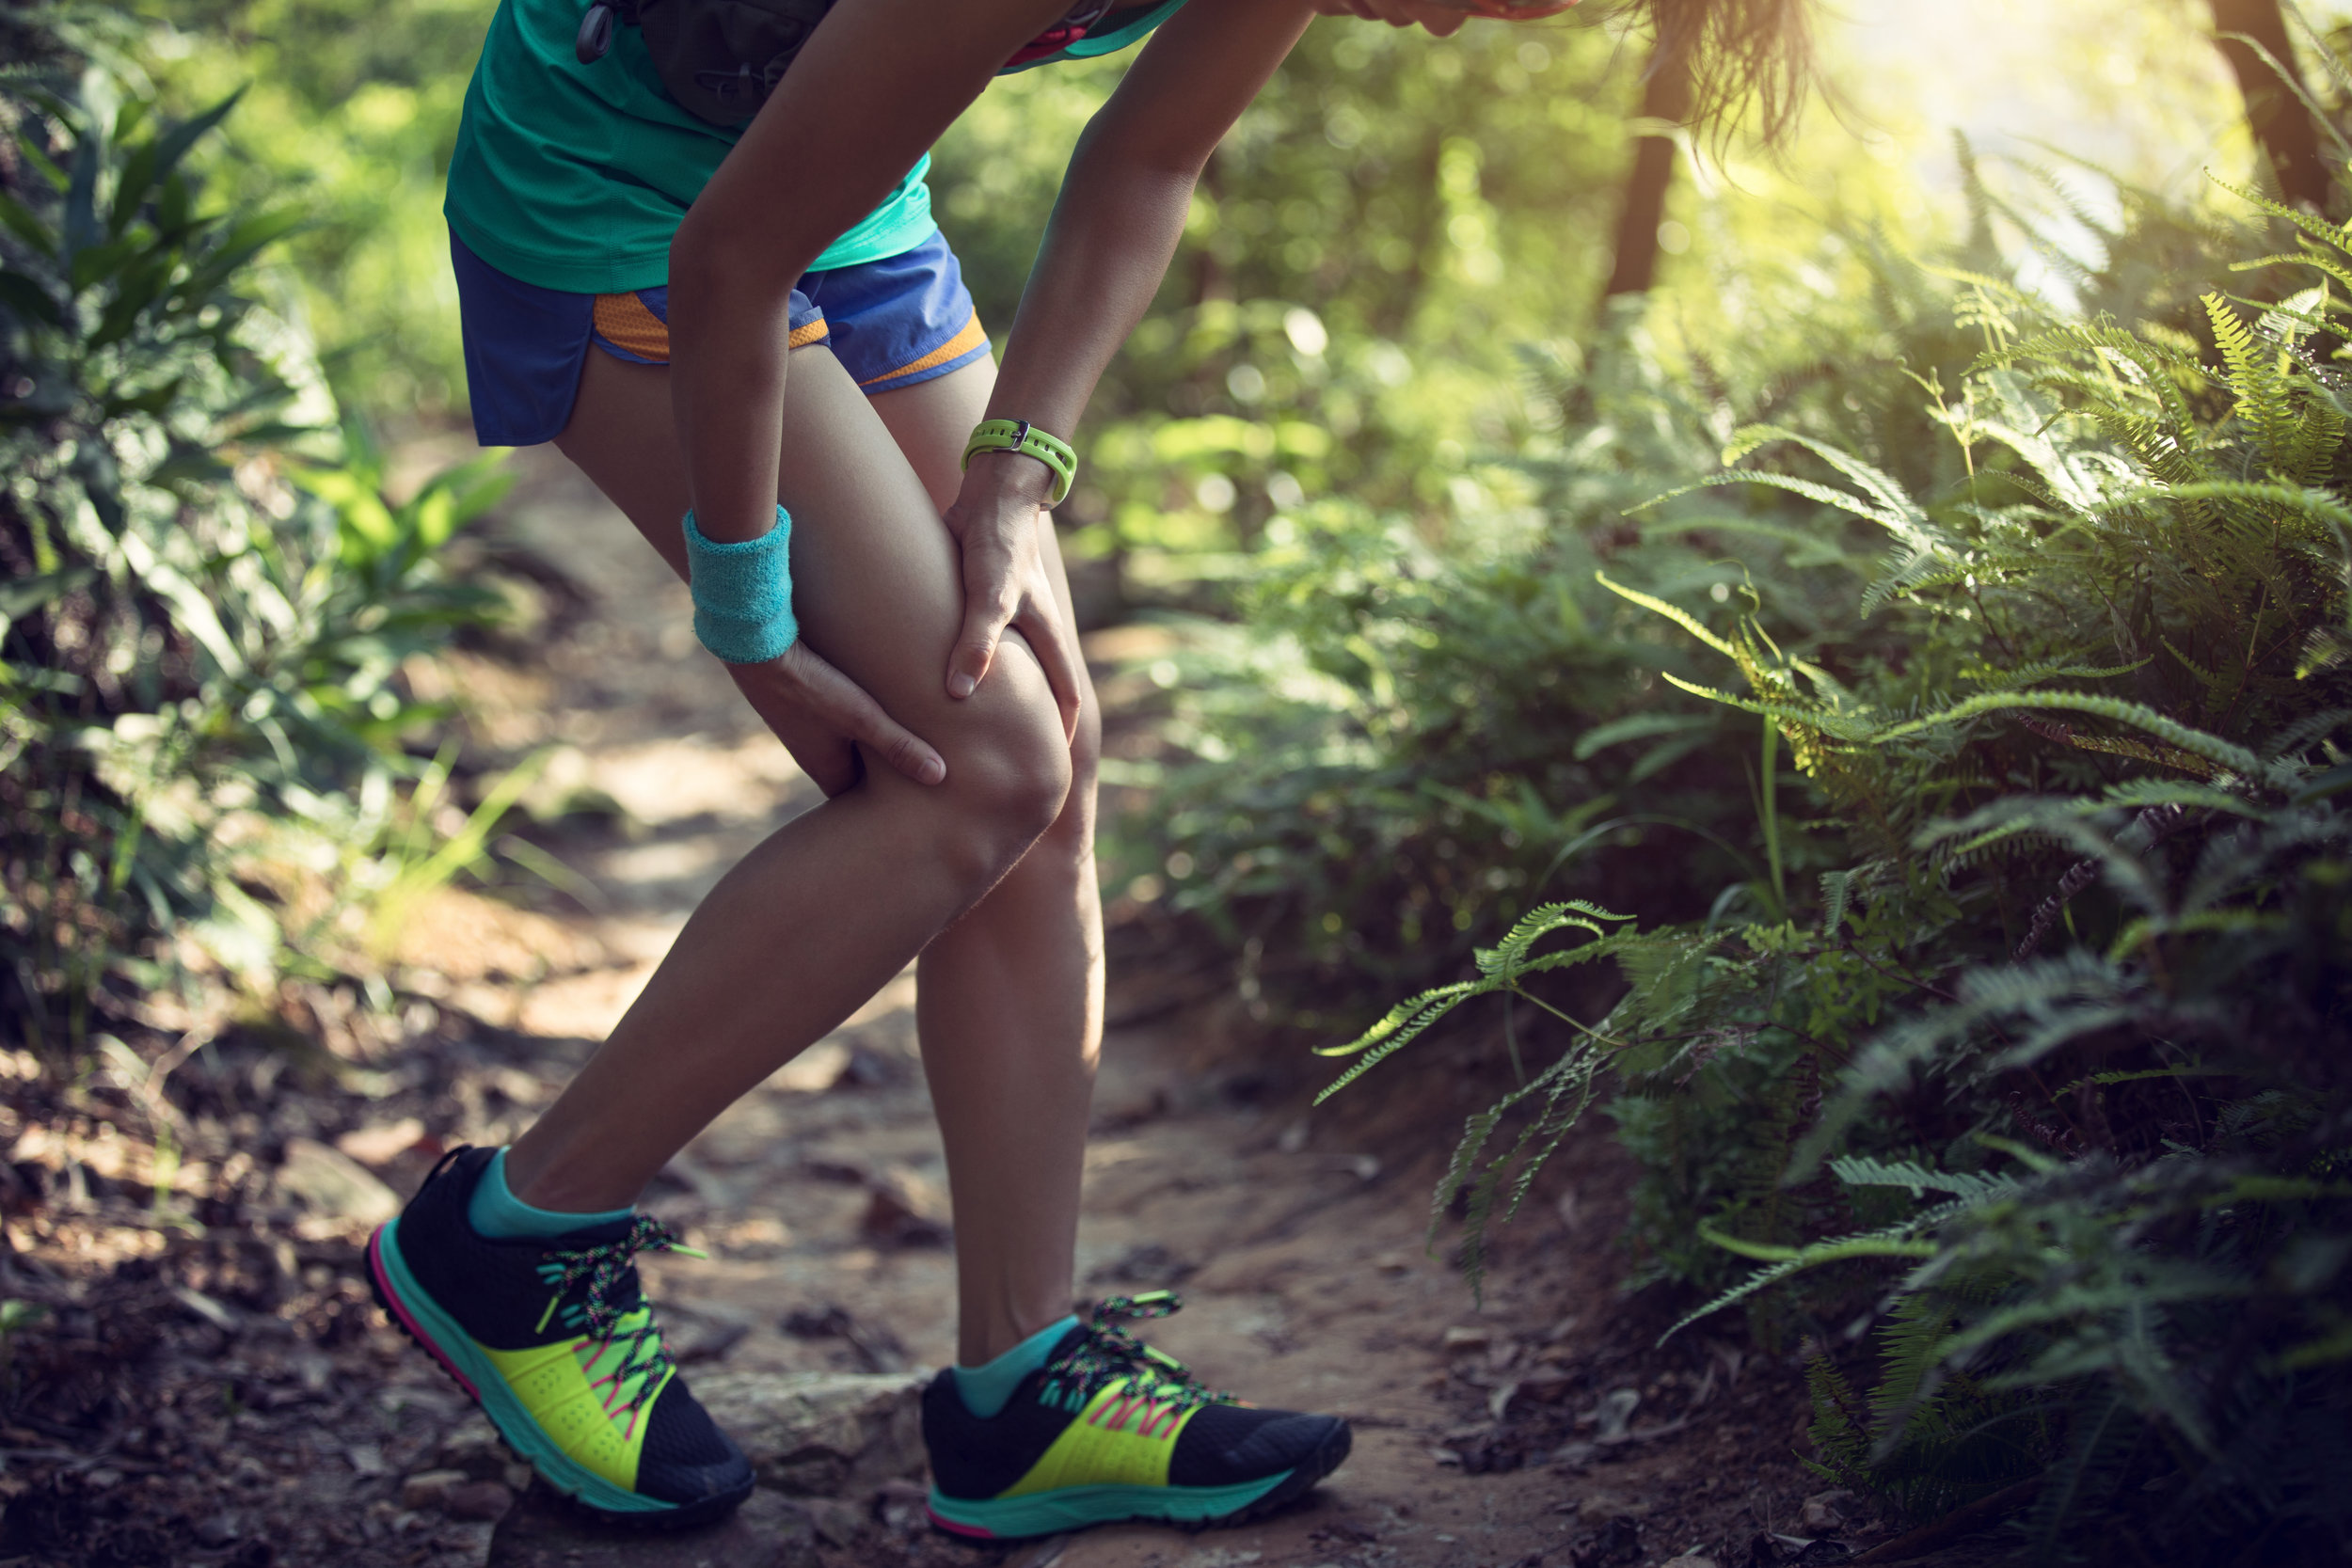 sports-injured-knee-6RG84DB.JPG